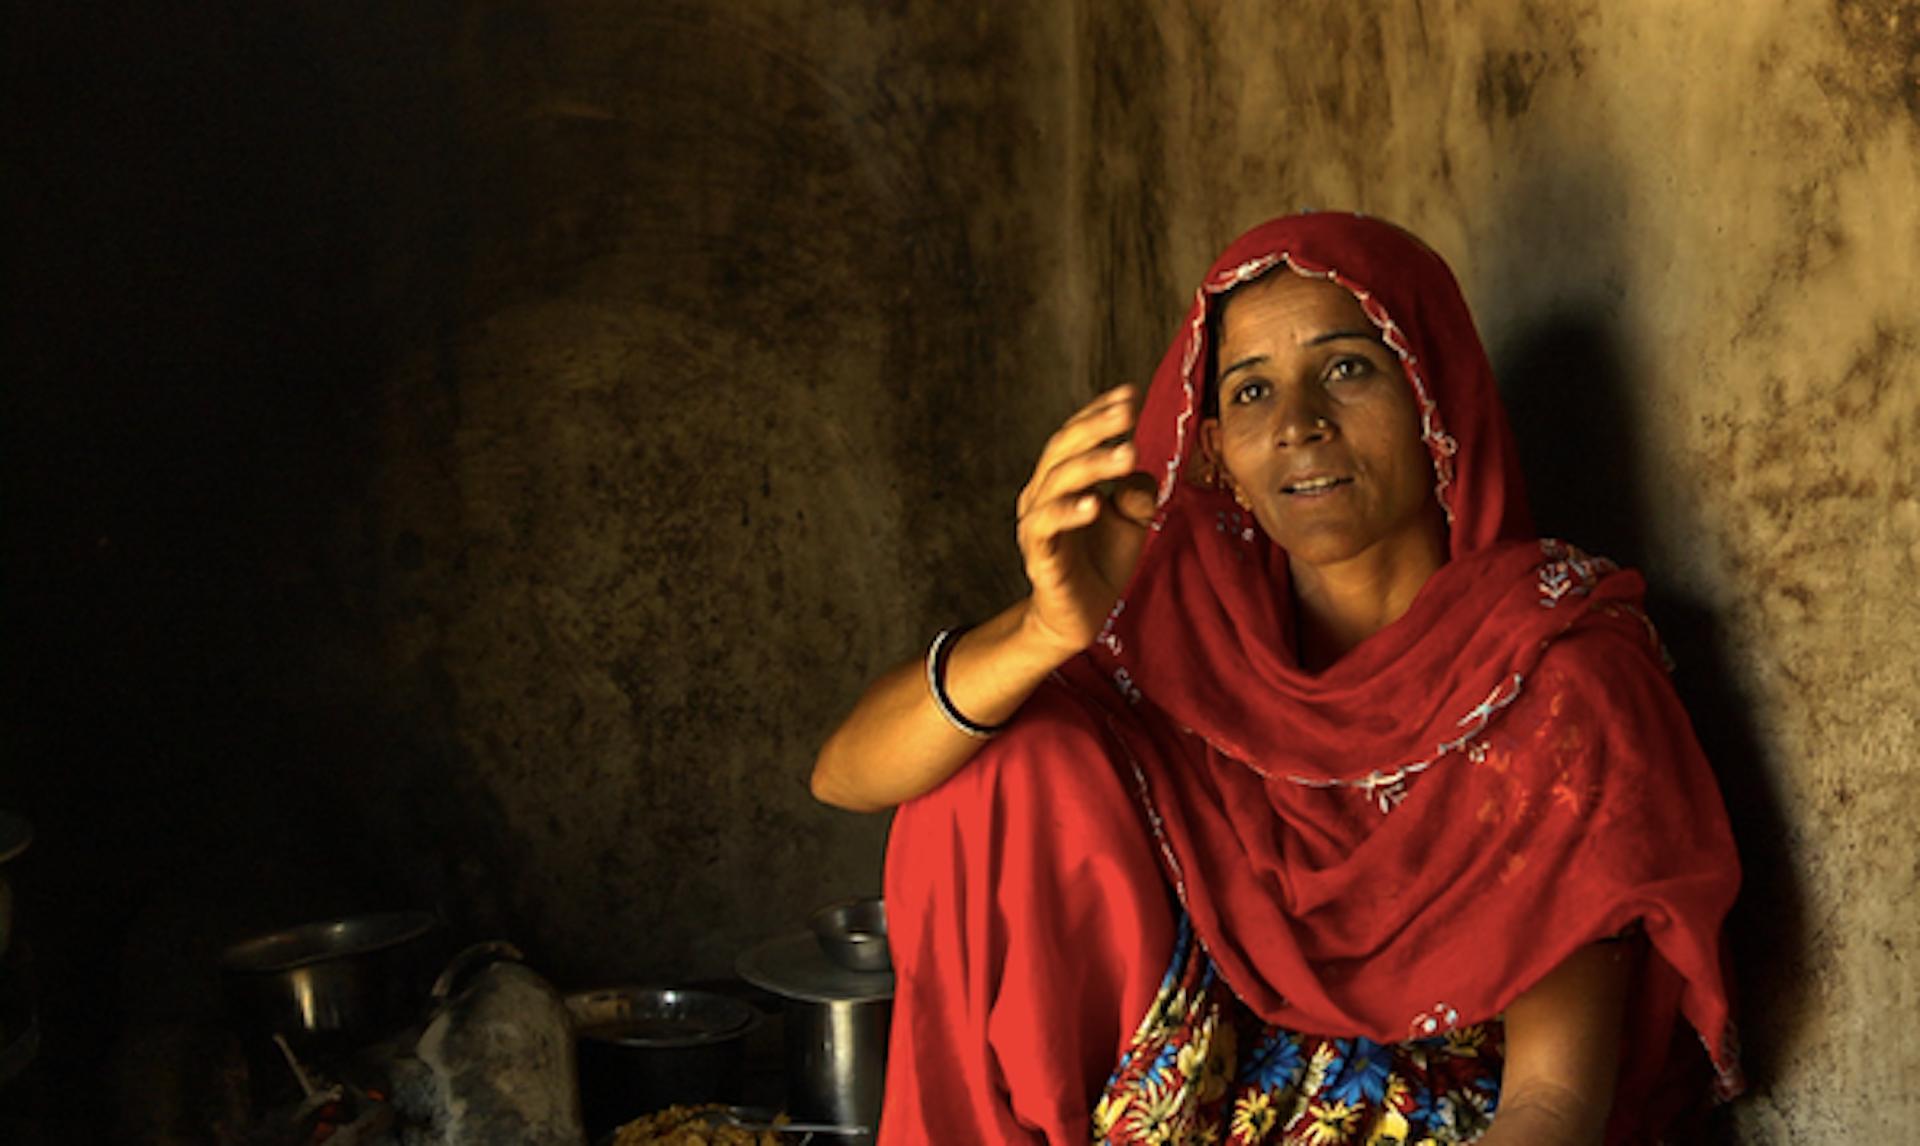 Zarina Sodha, from Lakhpath Kachchh, Gujarat (western India), a folk singer. Credit: Anjali Monteiro/KP Jayakrishnan